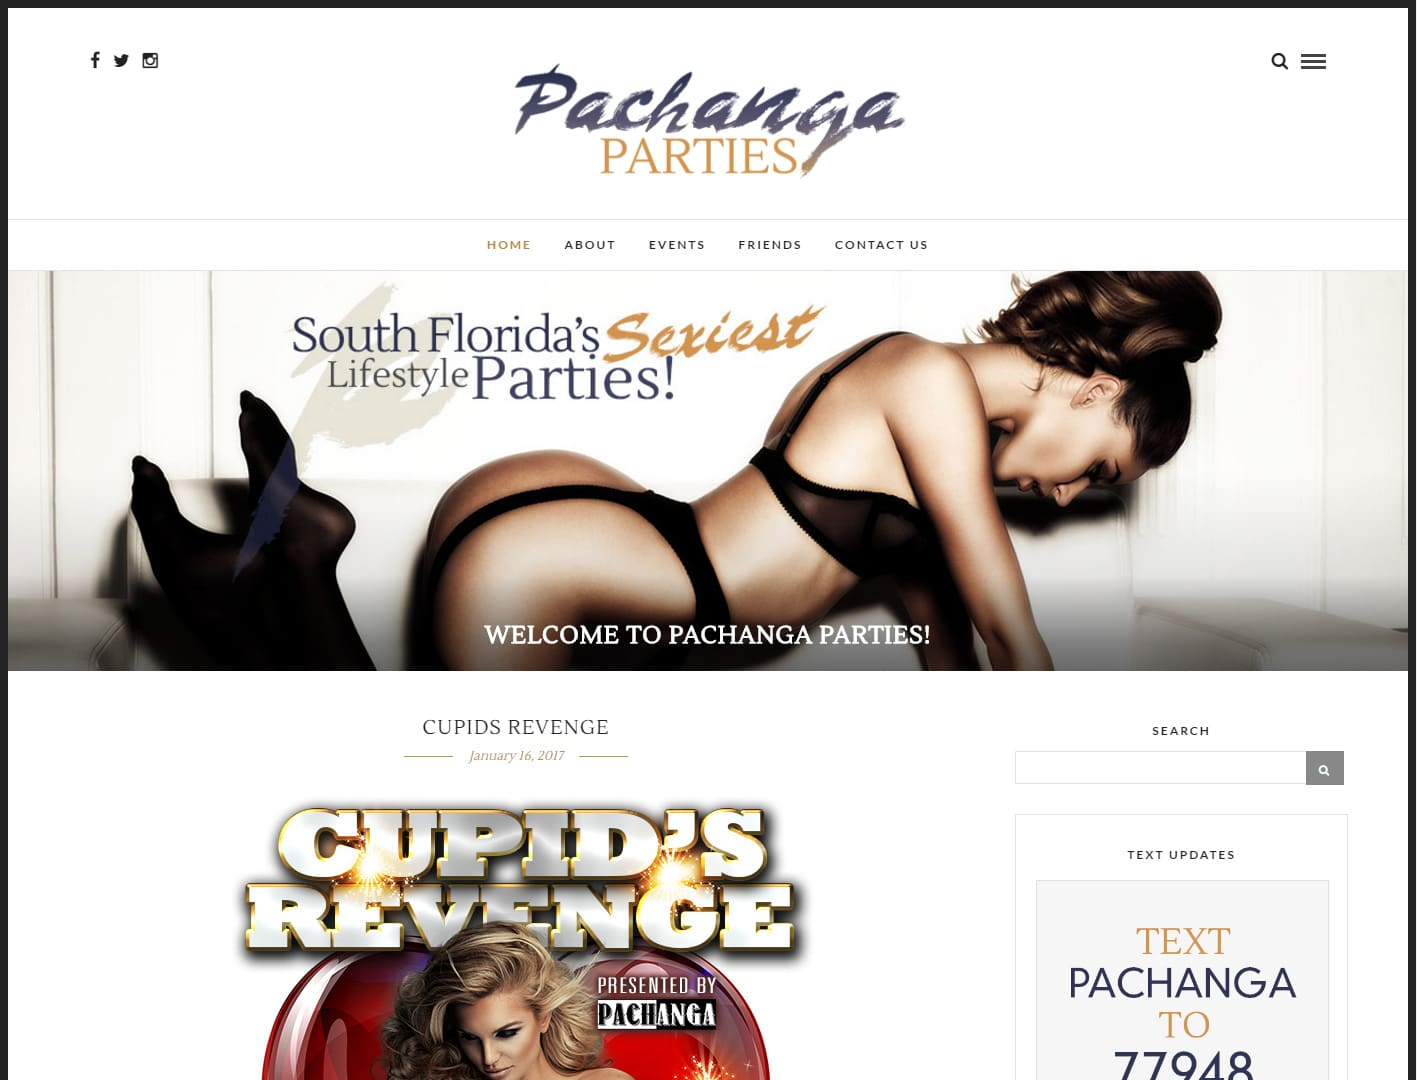 Pachanga Parties